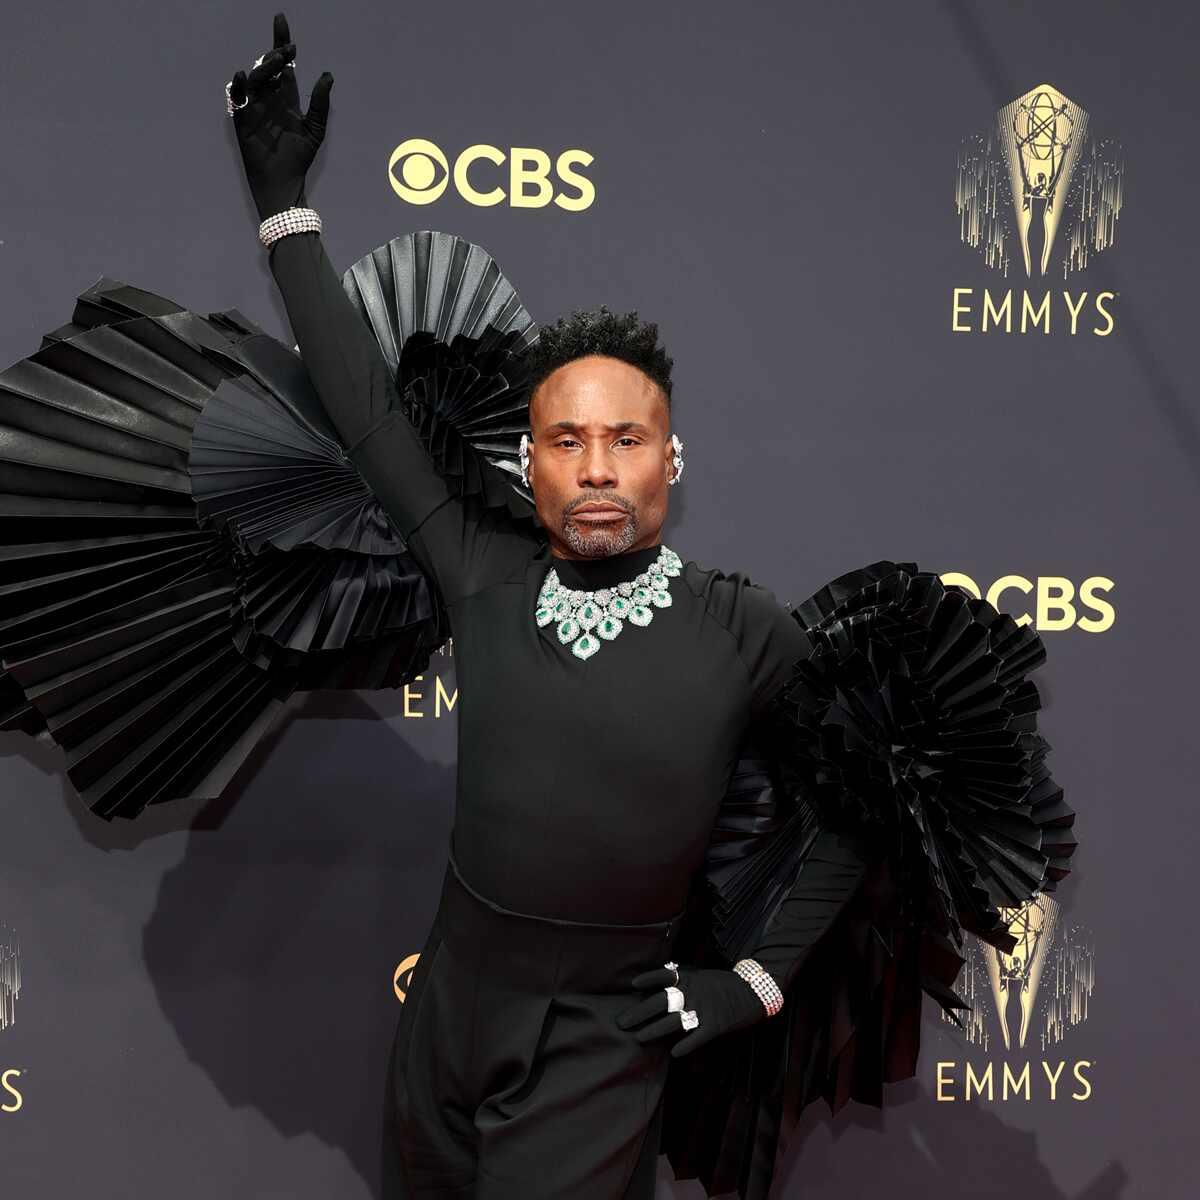 Billy Porter, 2021 Emmys, Emmy Awards, Red Carpet Fashions, Arrivals, Riskiest Looks